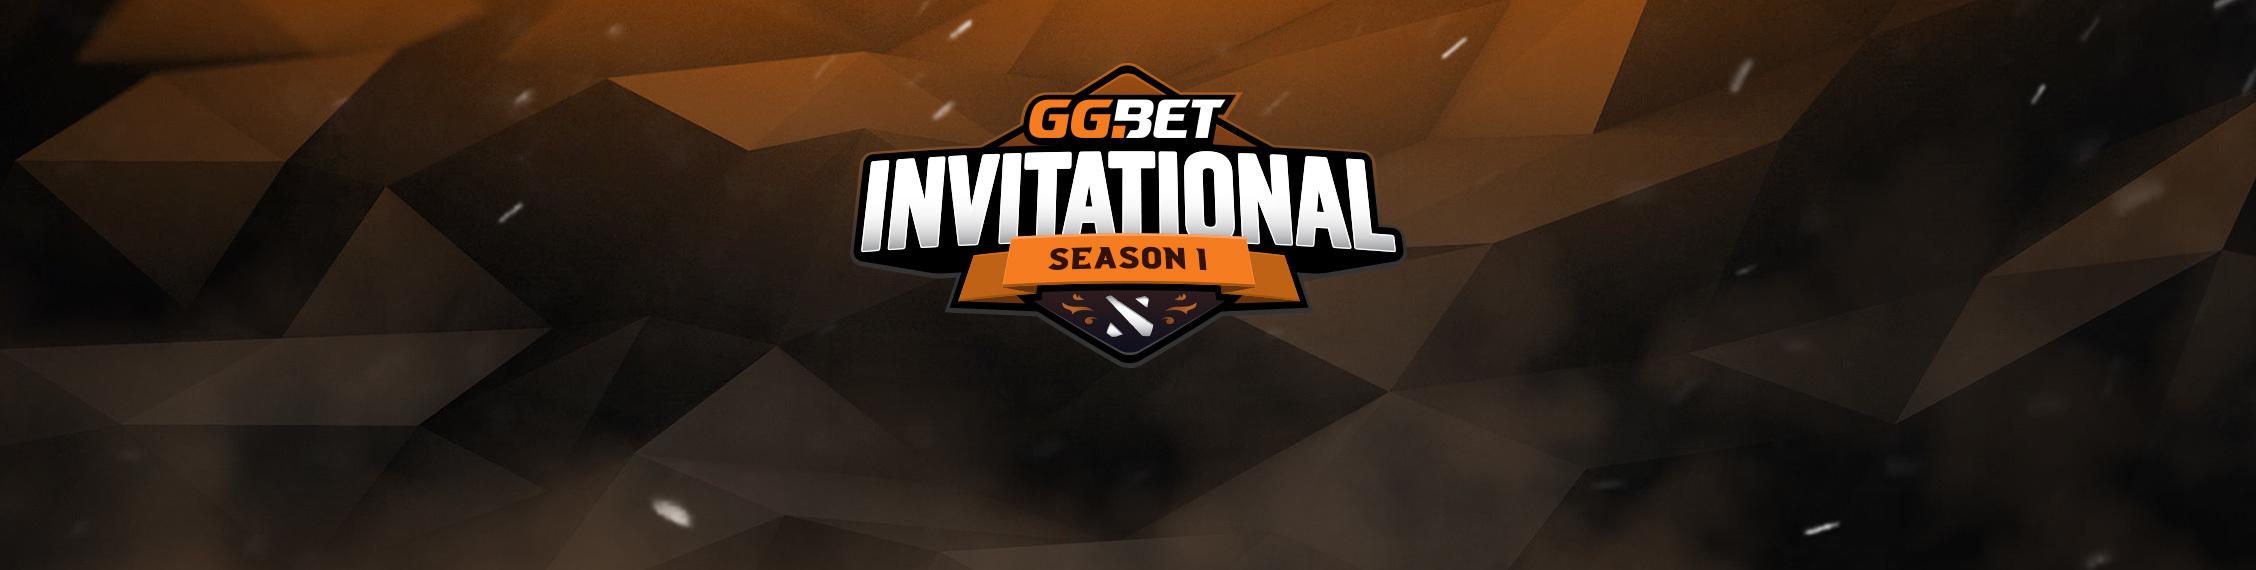 GG.Bet Dota 2 Invitational